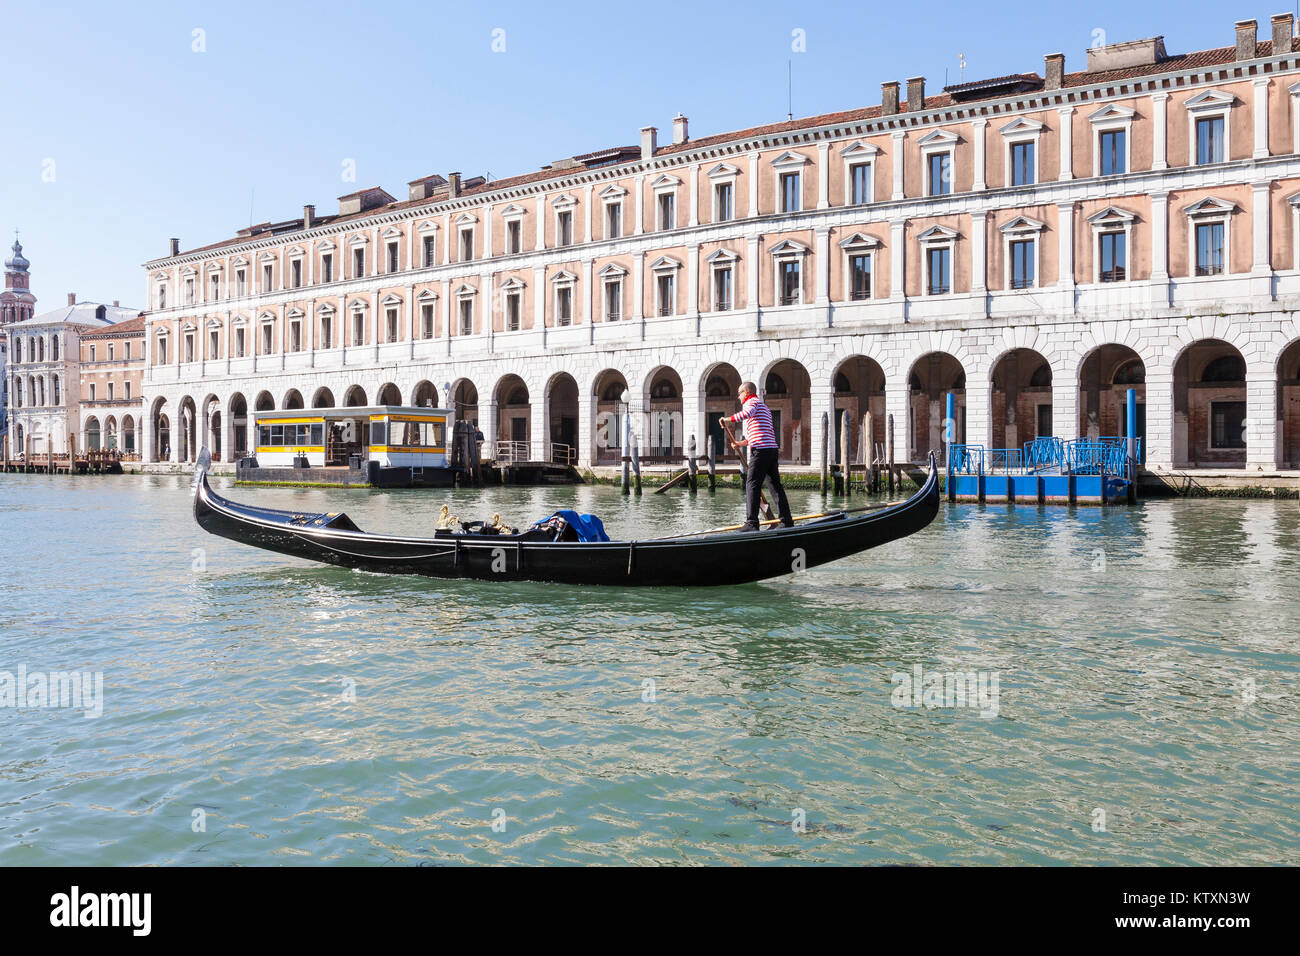 Gondolier rowing a gondola  on the Grand Canal at Rialto Mercato, San Polo, Venice, Italy - Stock Image